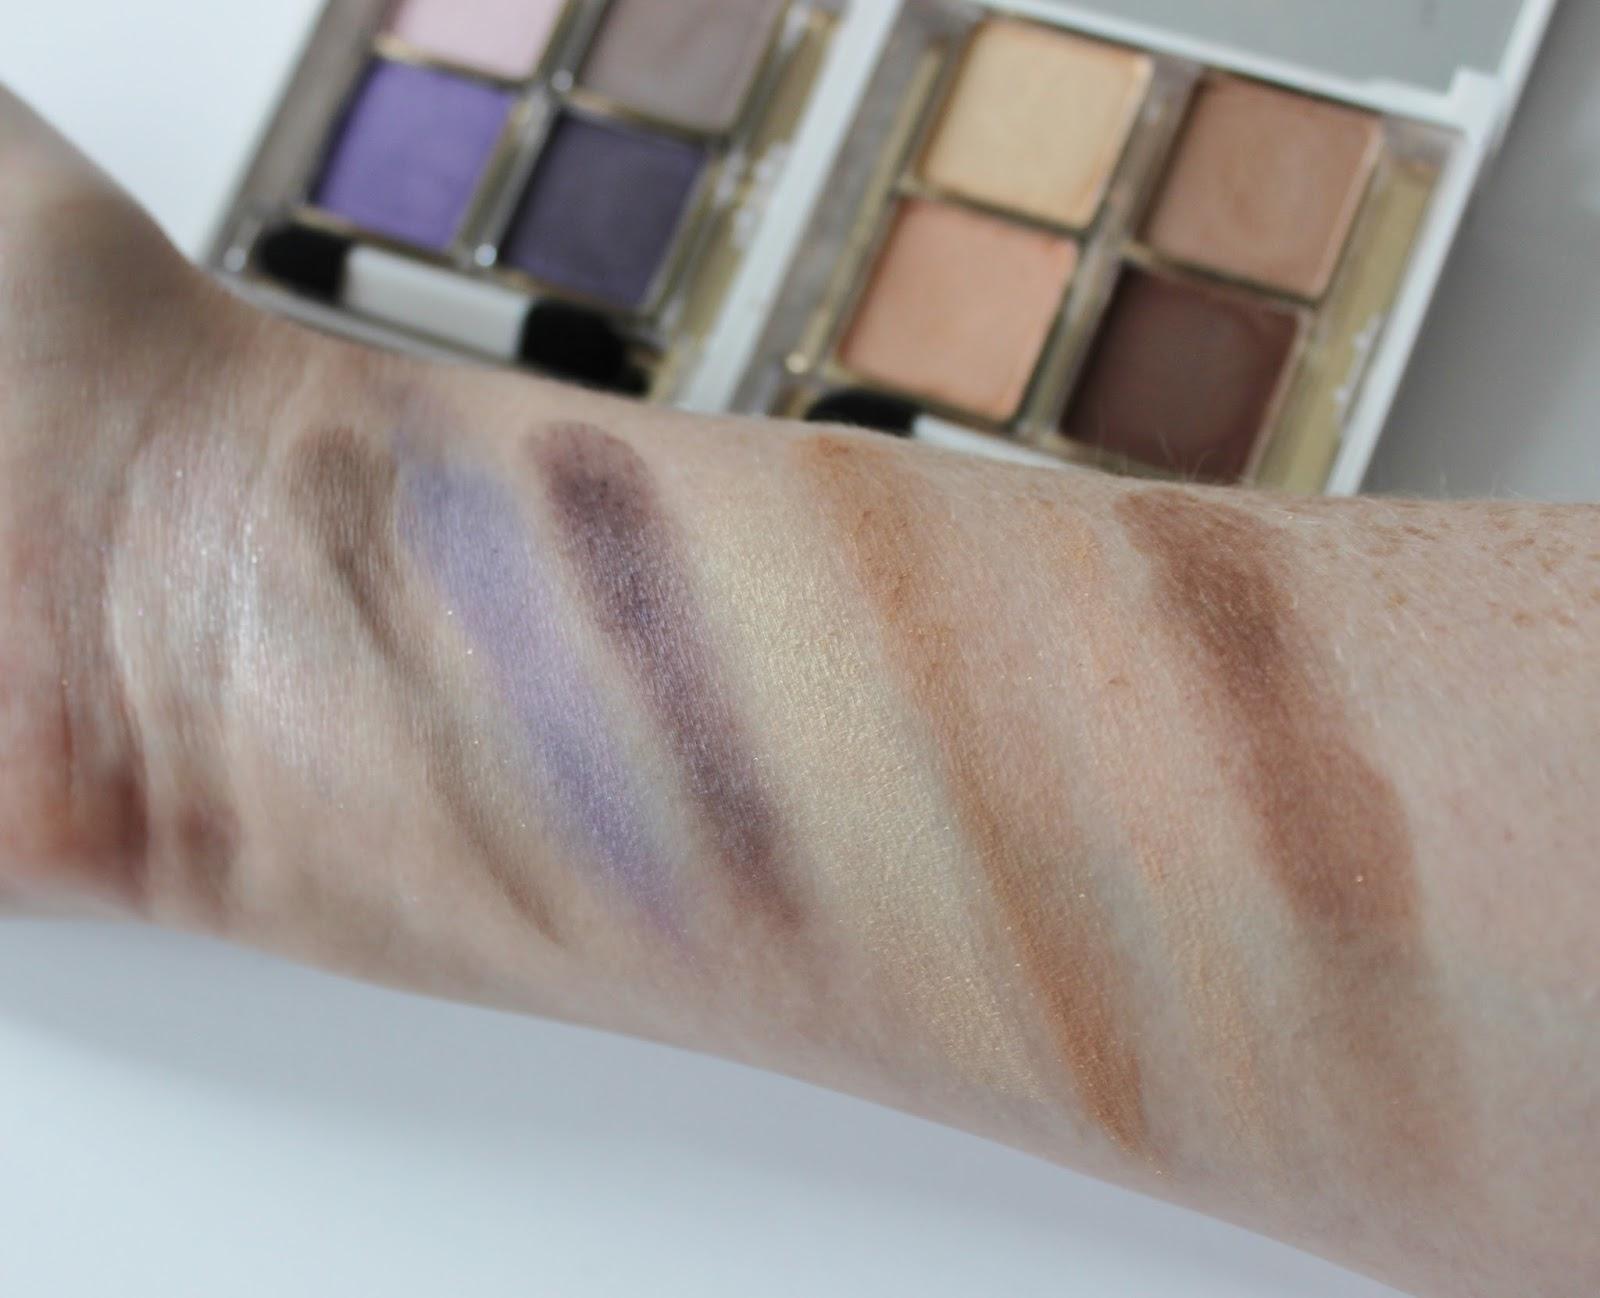 Elizabeth Arden untold aw14 makeup launches eyeshadow quad swatches